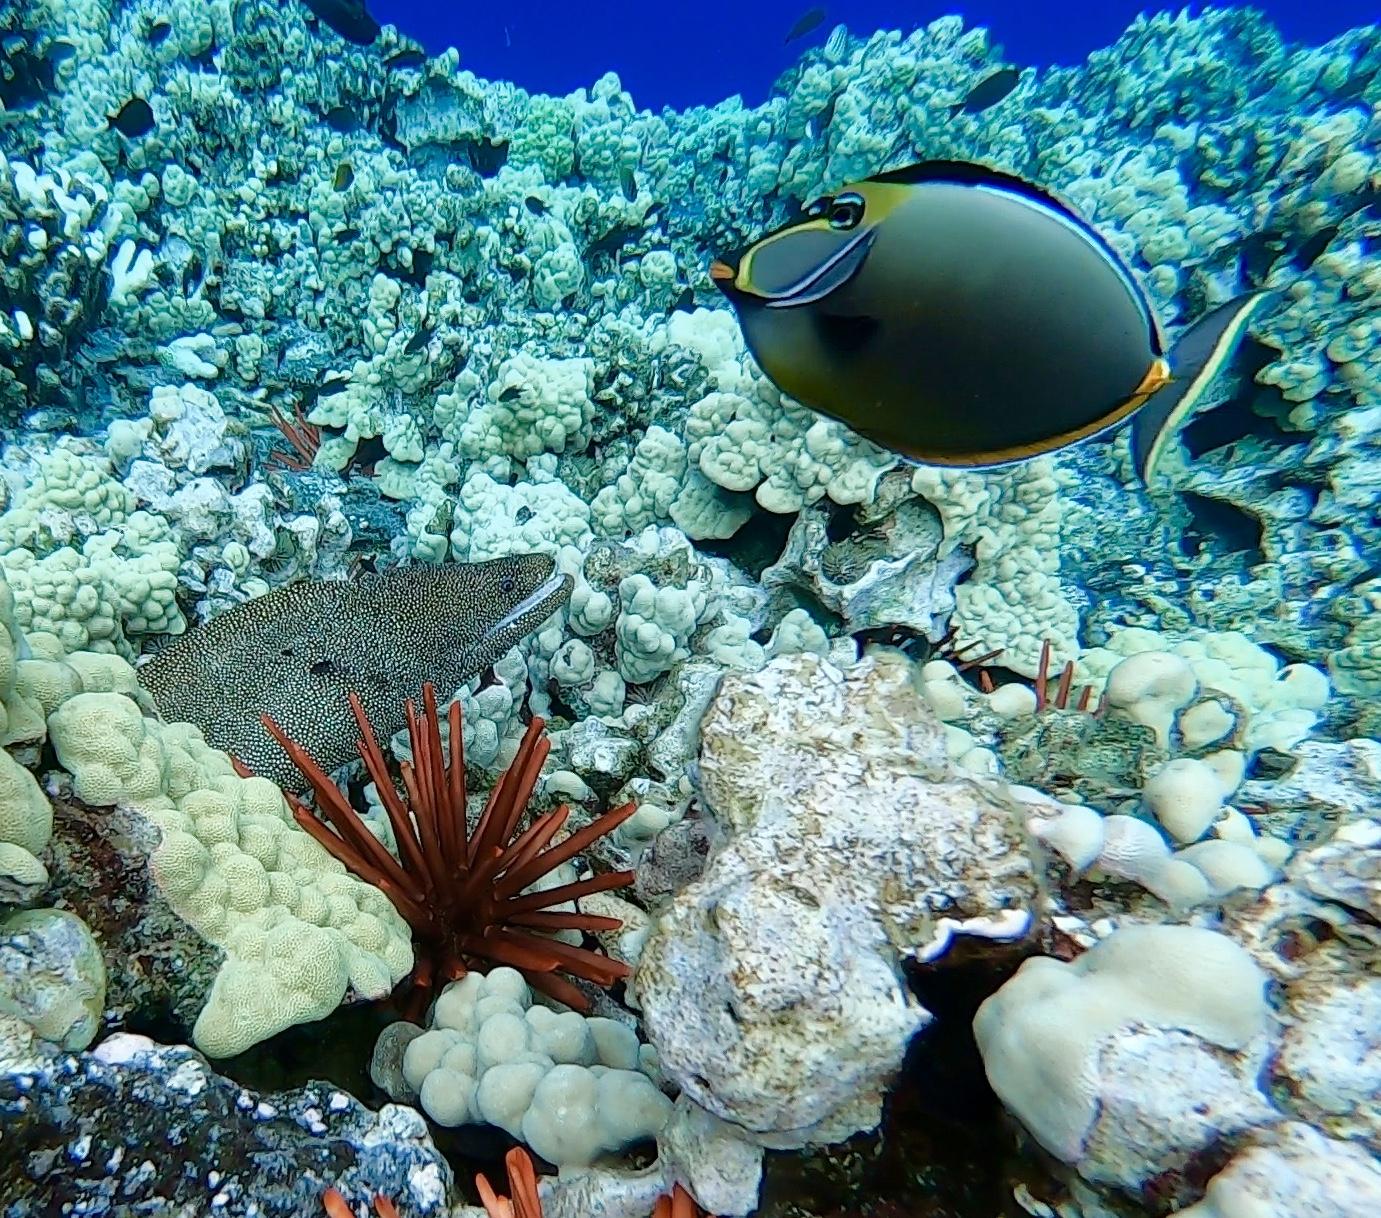 Blue_Soul_Maui_Snorkeling_Fish_3.jpg